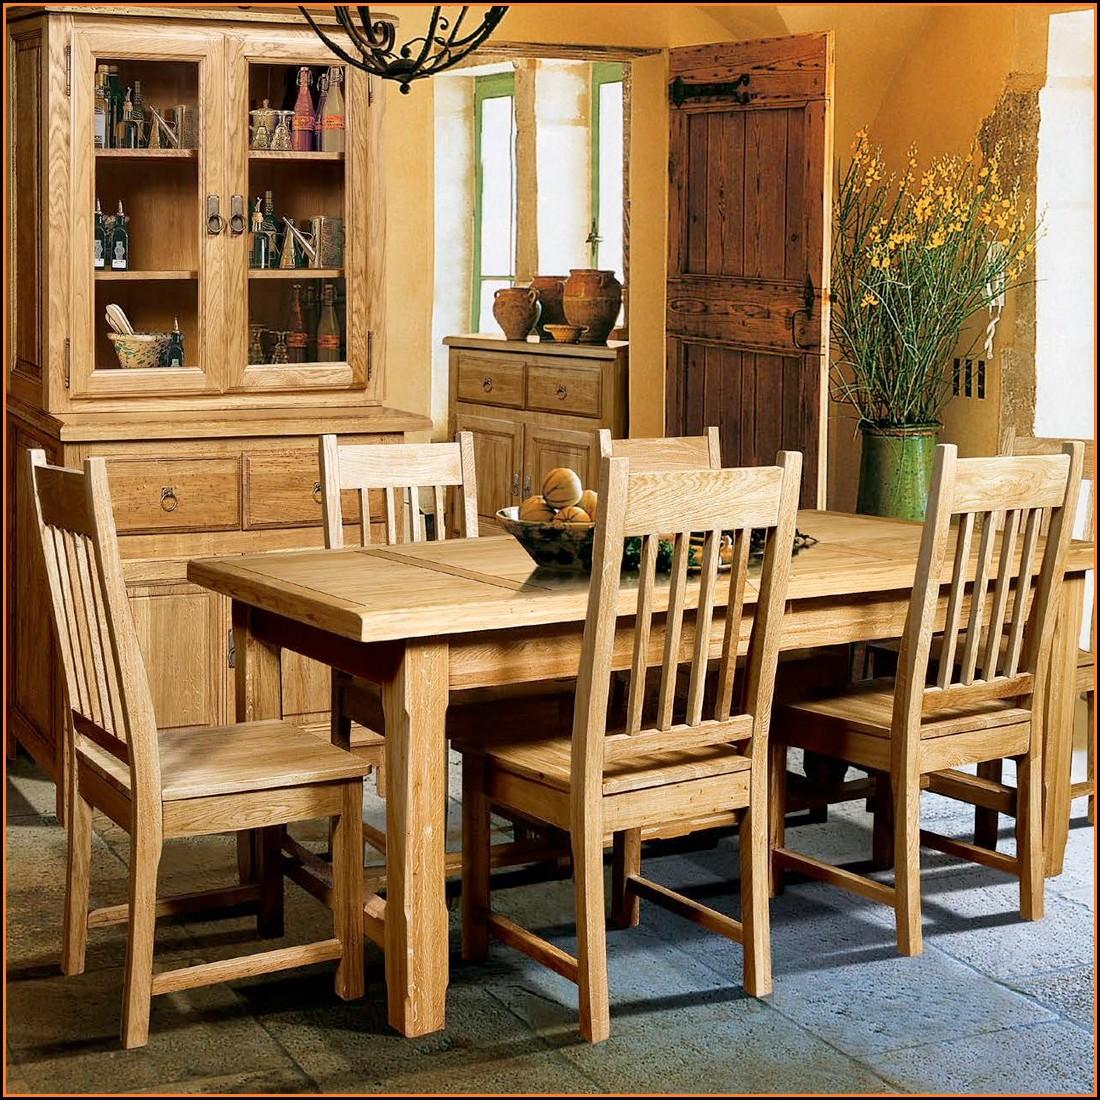 Esszimmer Stühle Moderner Landhausstil